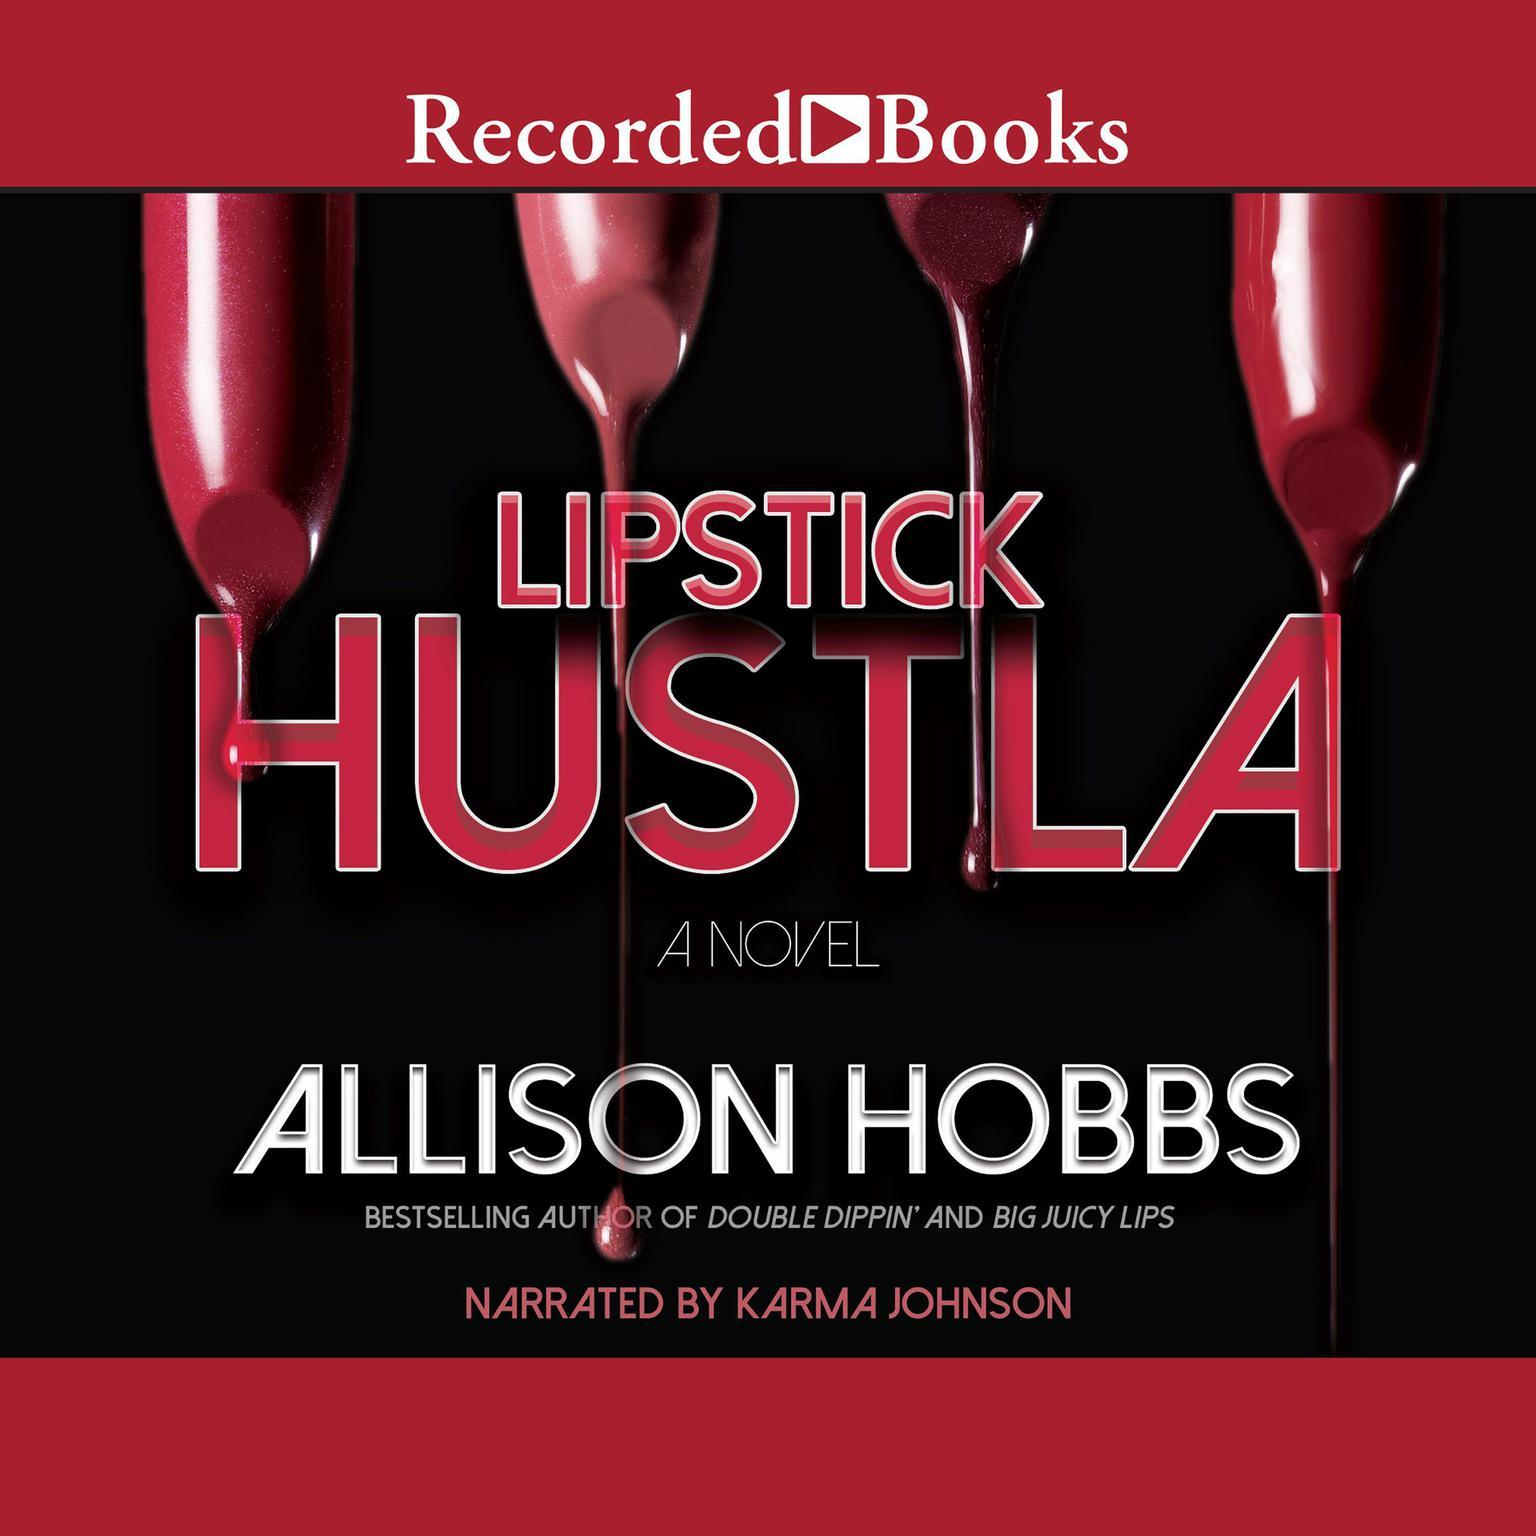 Lipstick Hustla Audiobook, by Allison Hobbs